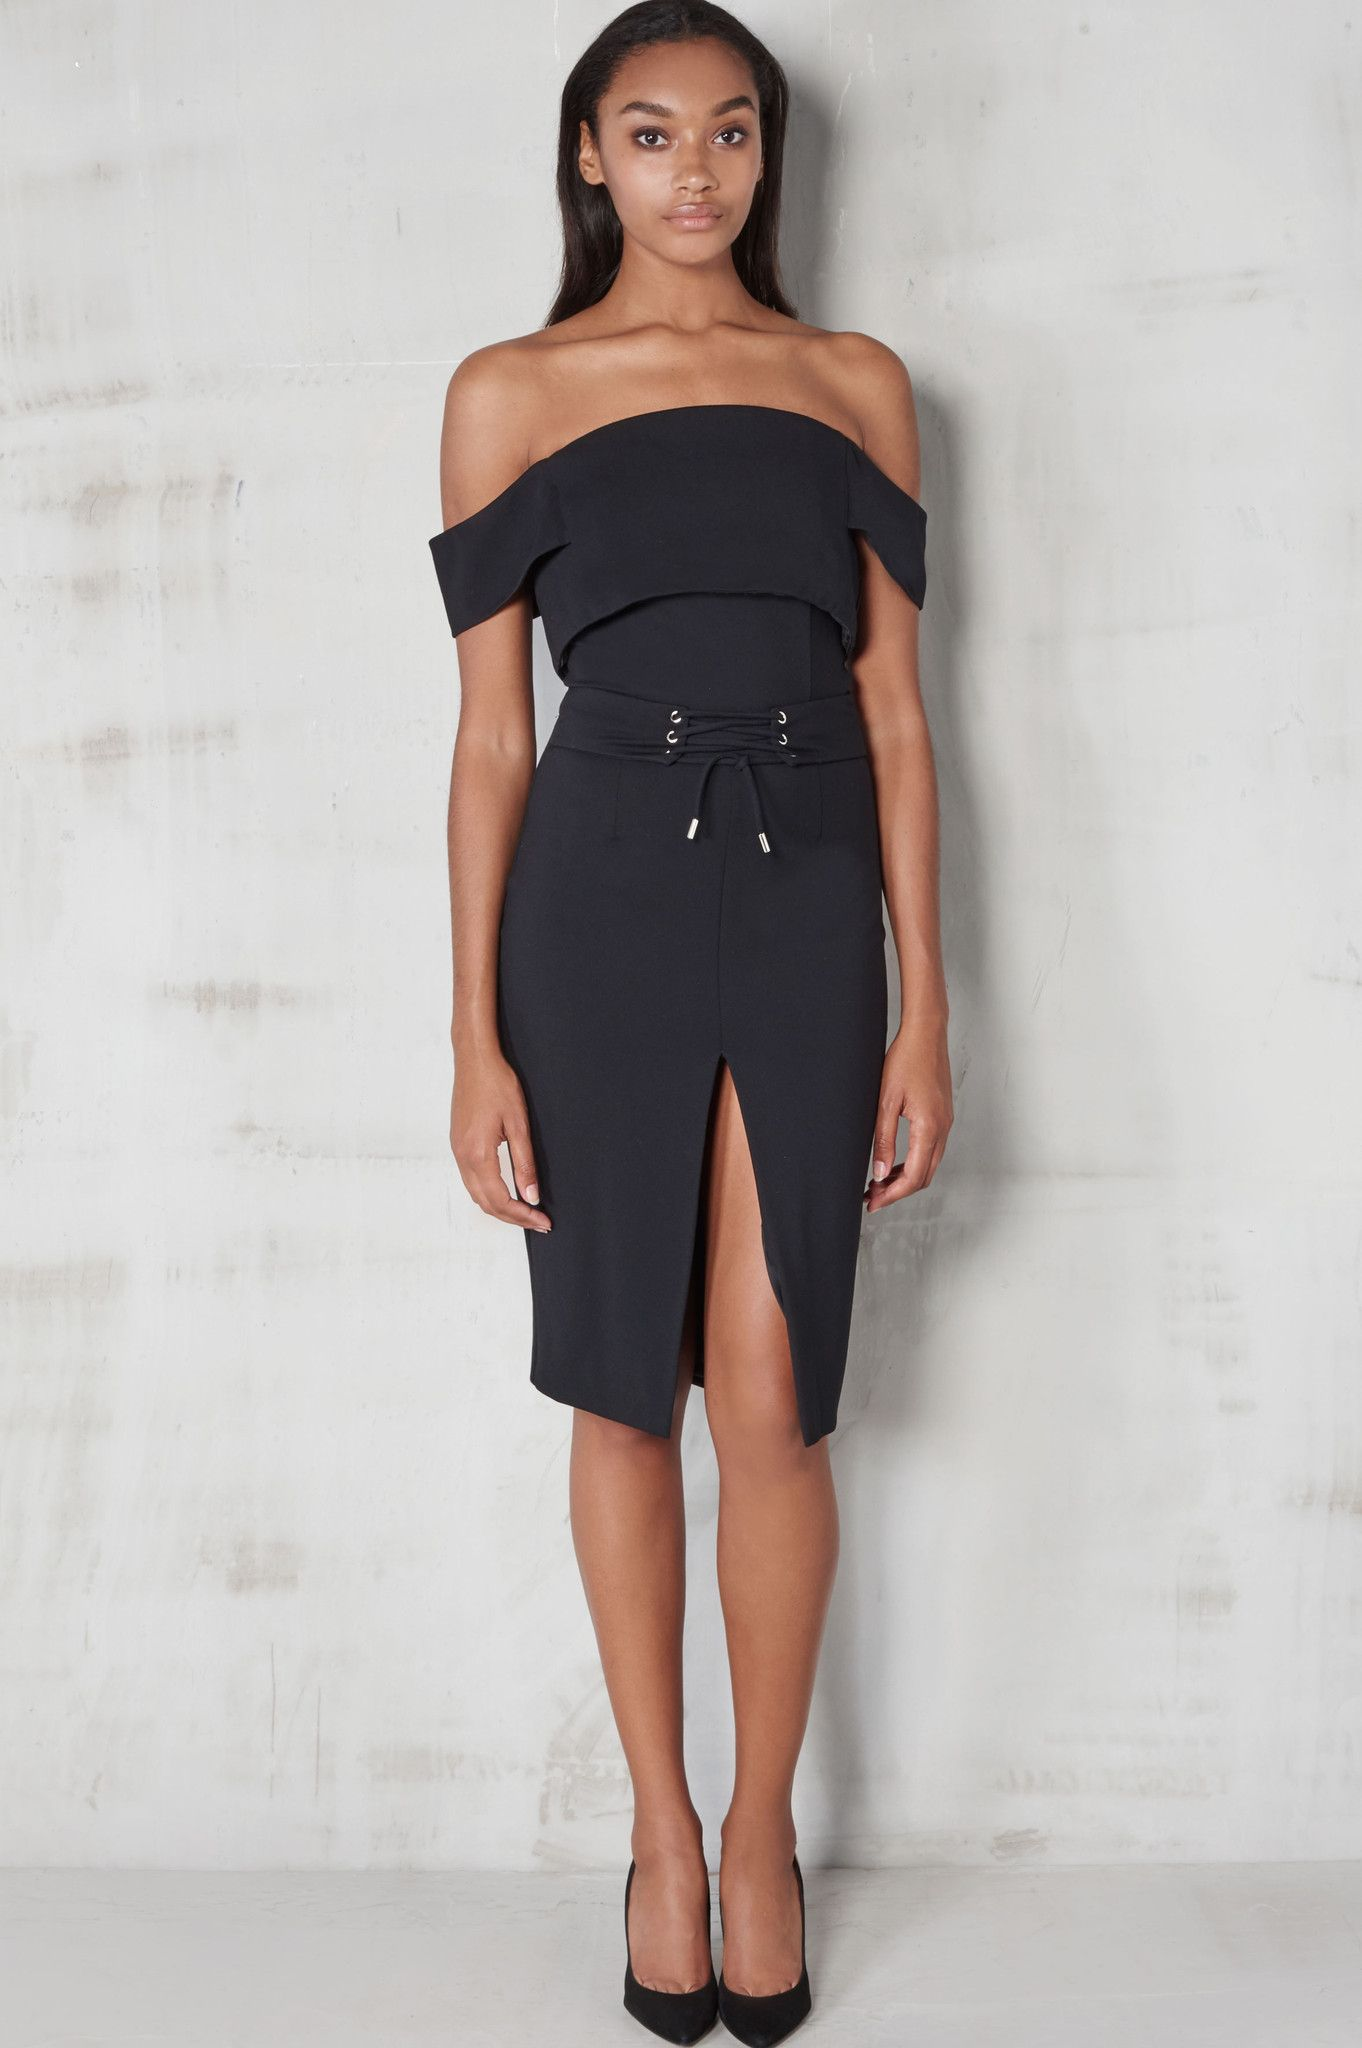 ea33163d6b5 Lavish Alice Black Off The Shoulder Corset Belt Detail Midi Dress ...